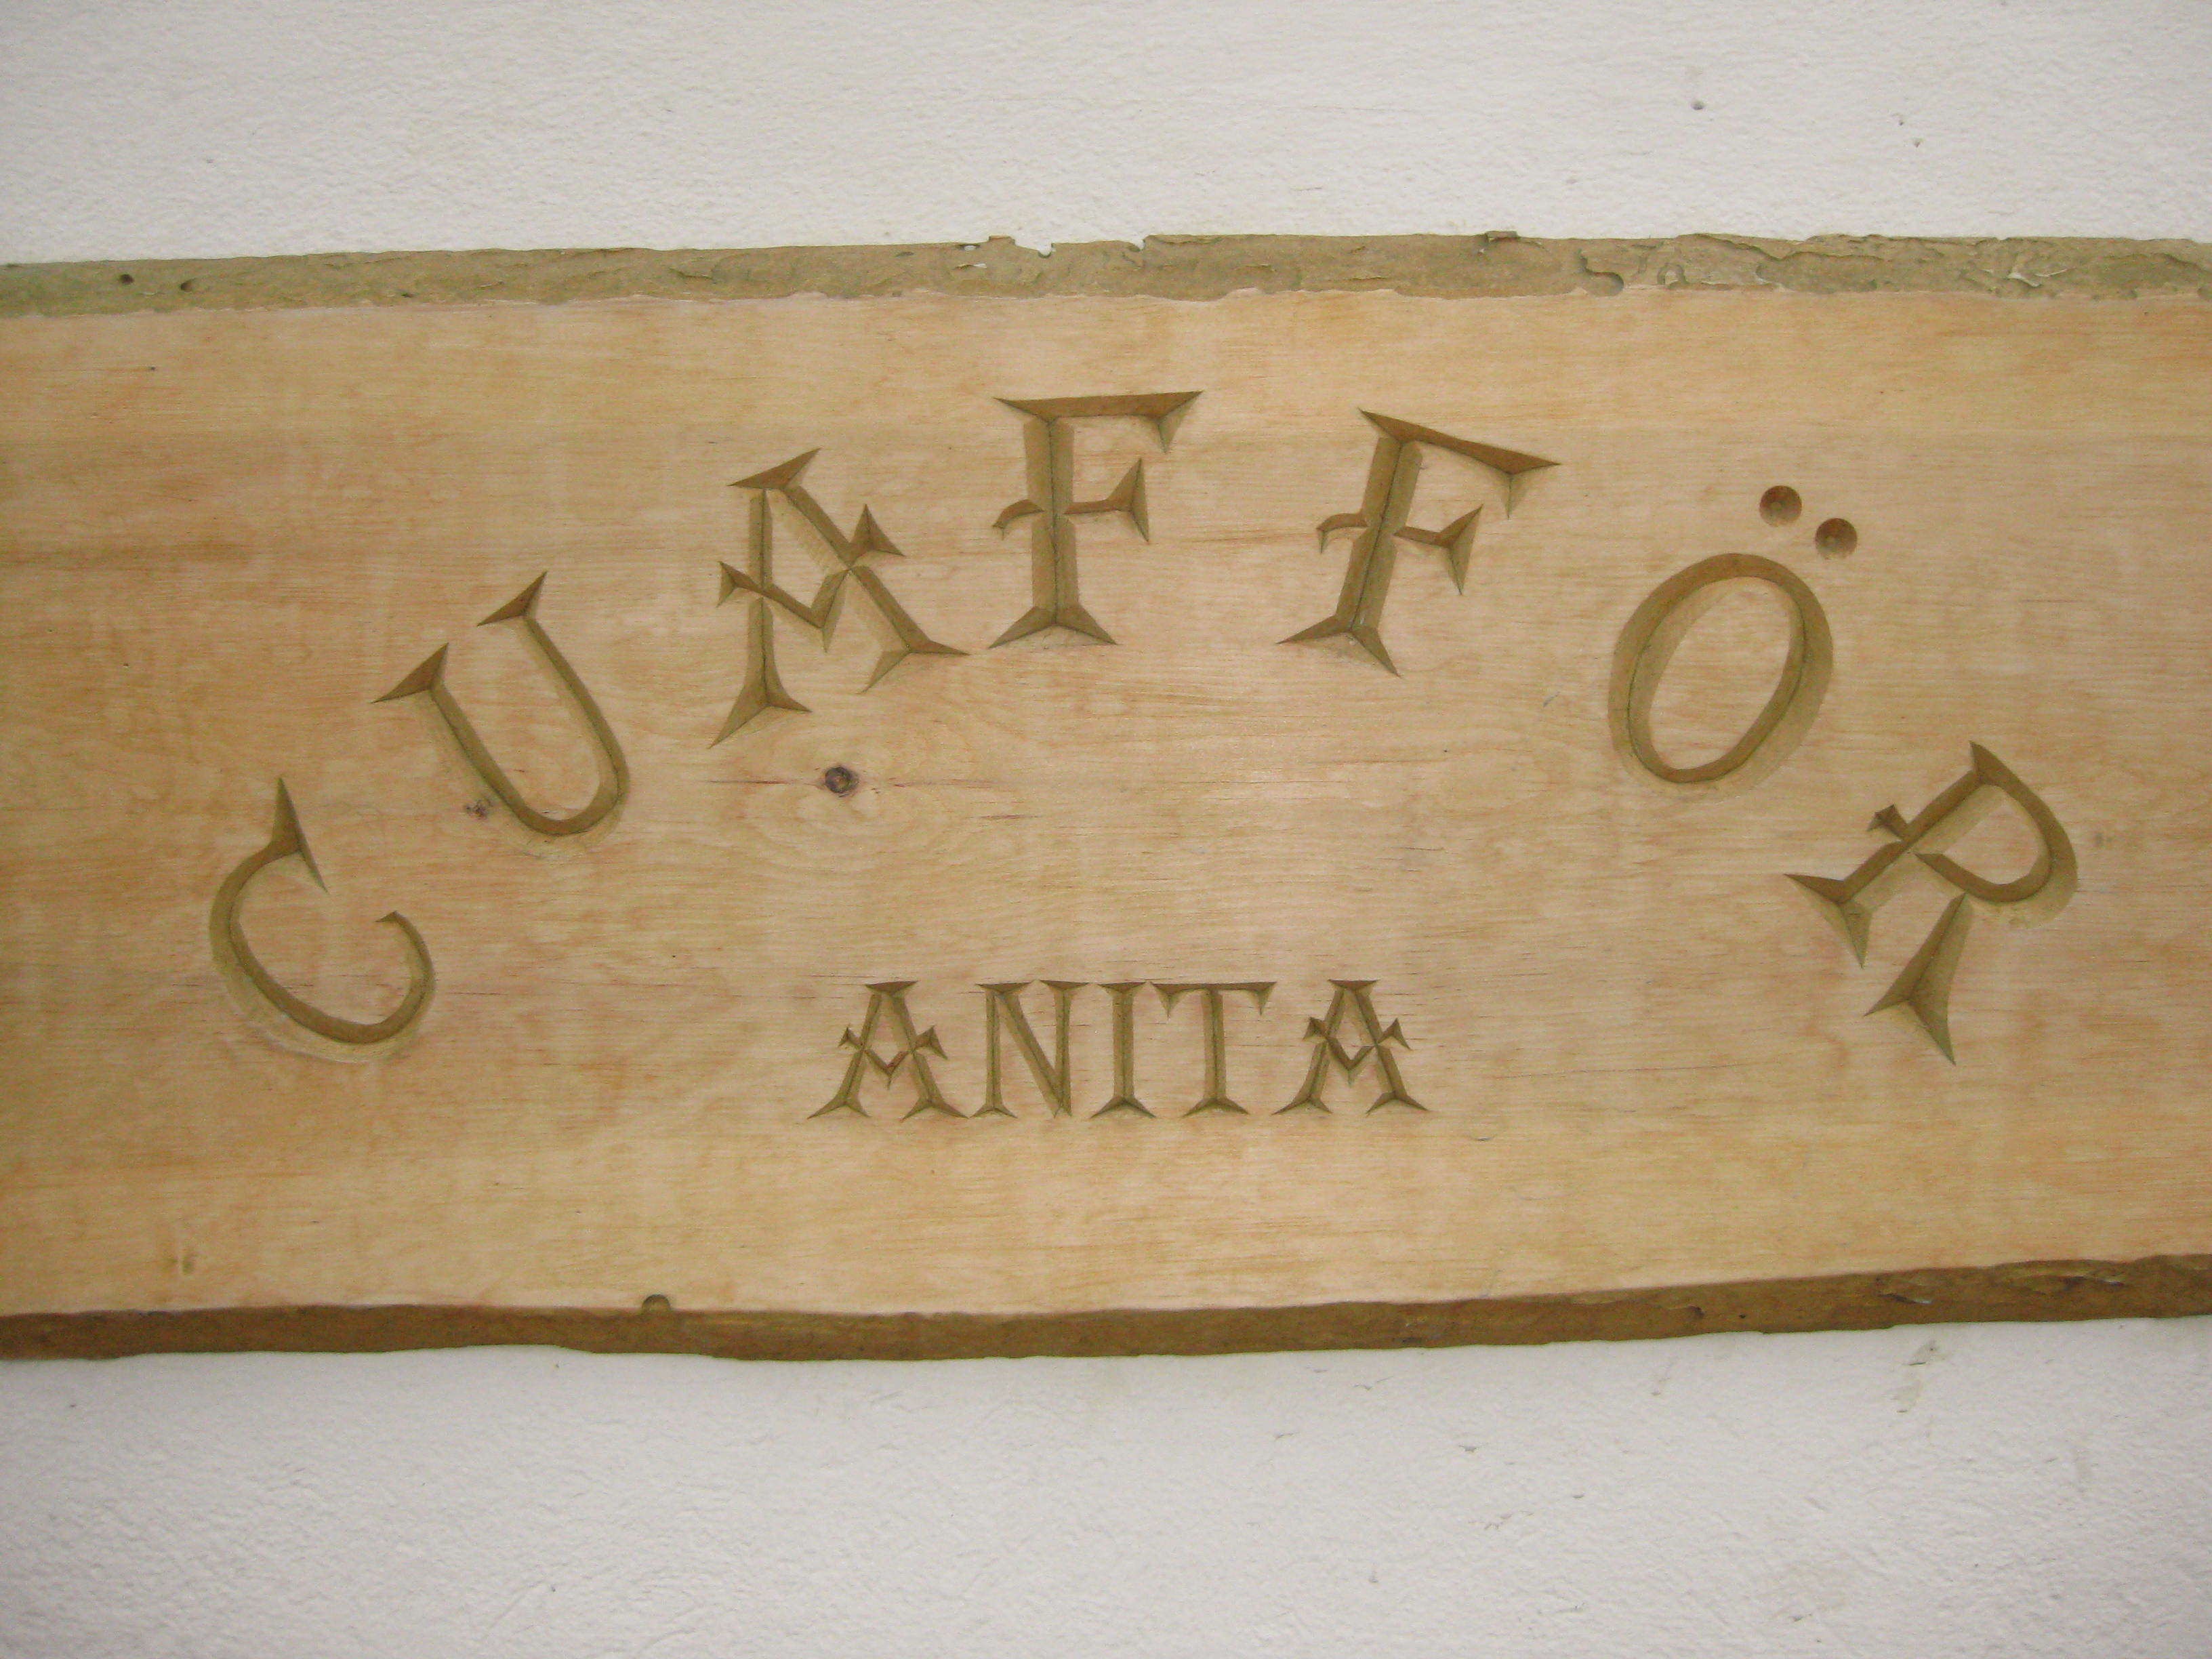 Coiffeur Anita Slide 2